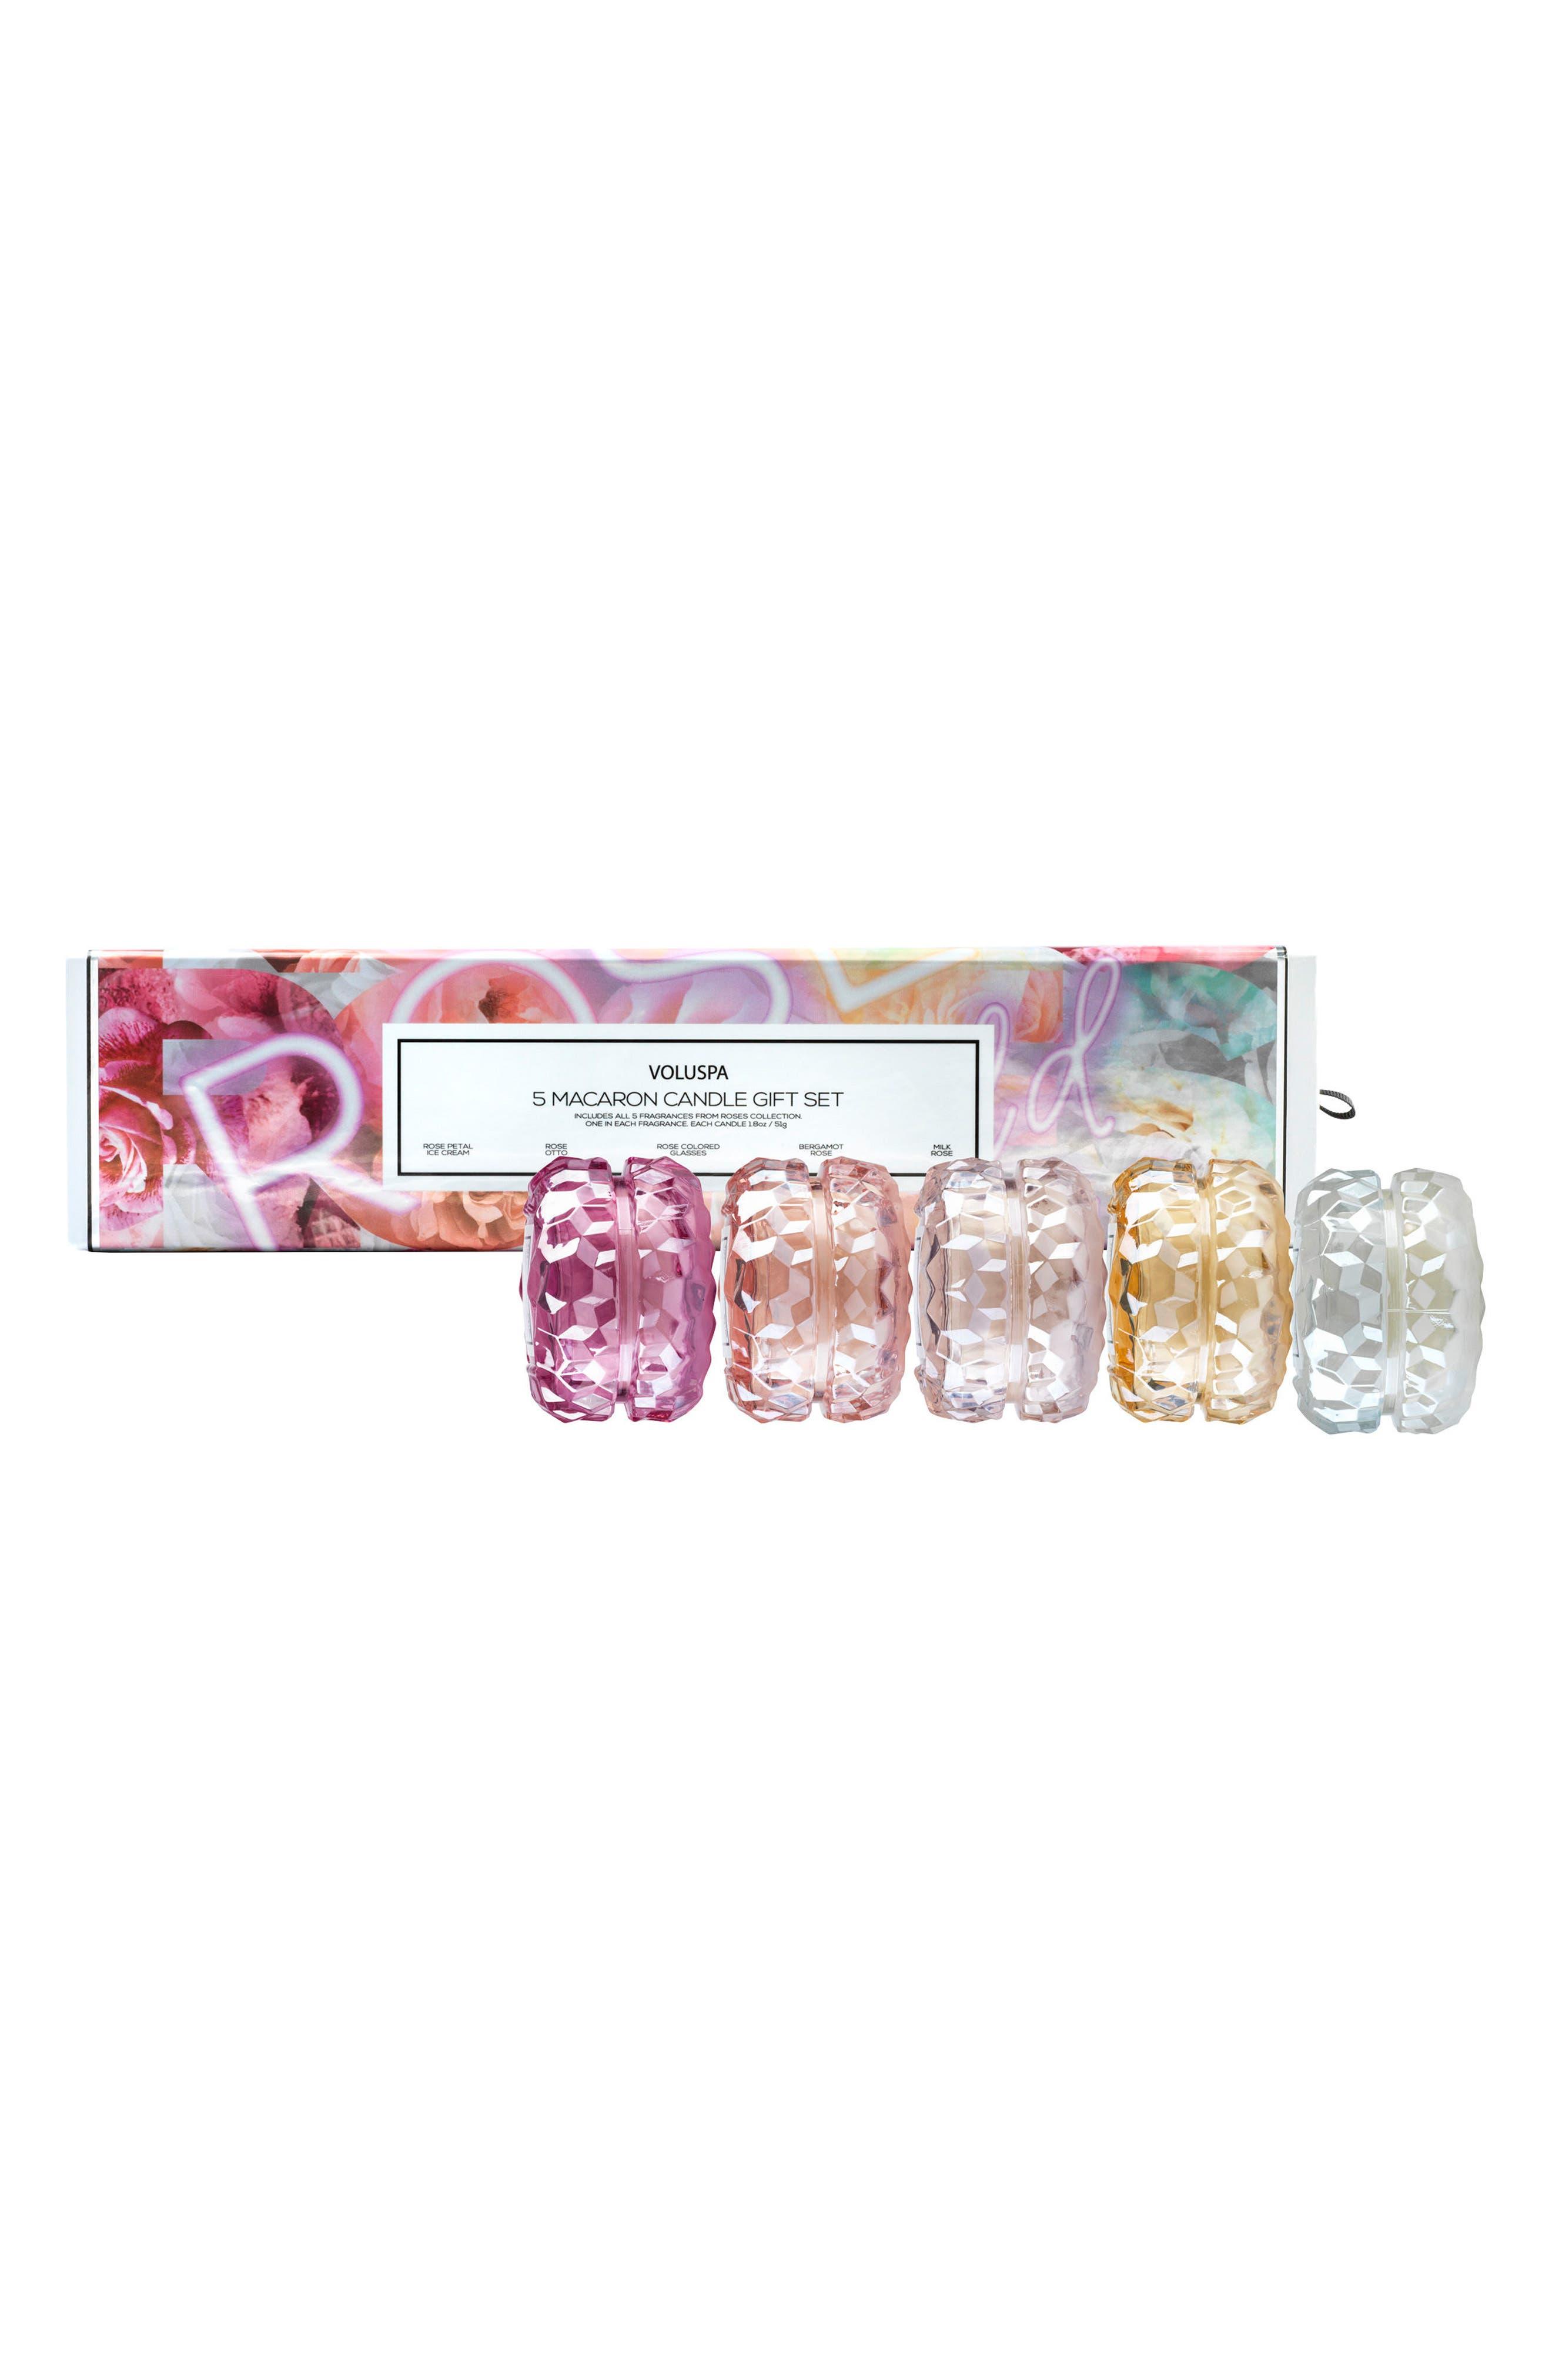 Roses Macaron Candle Set,                             Main thumbnail 1, color,                             NO COLOR